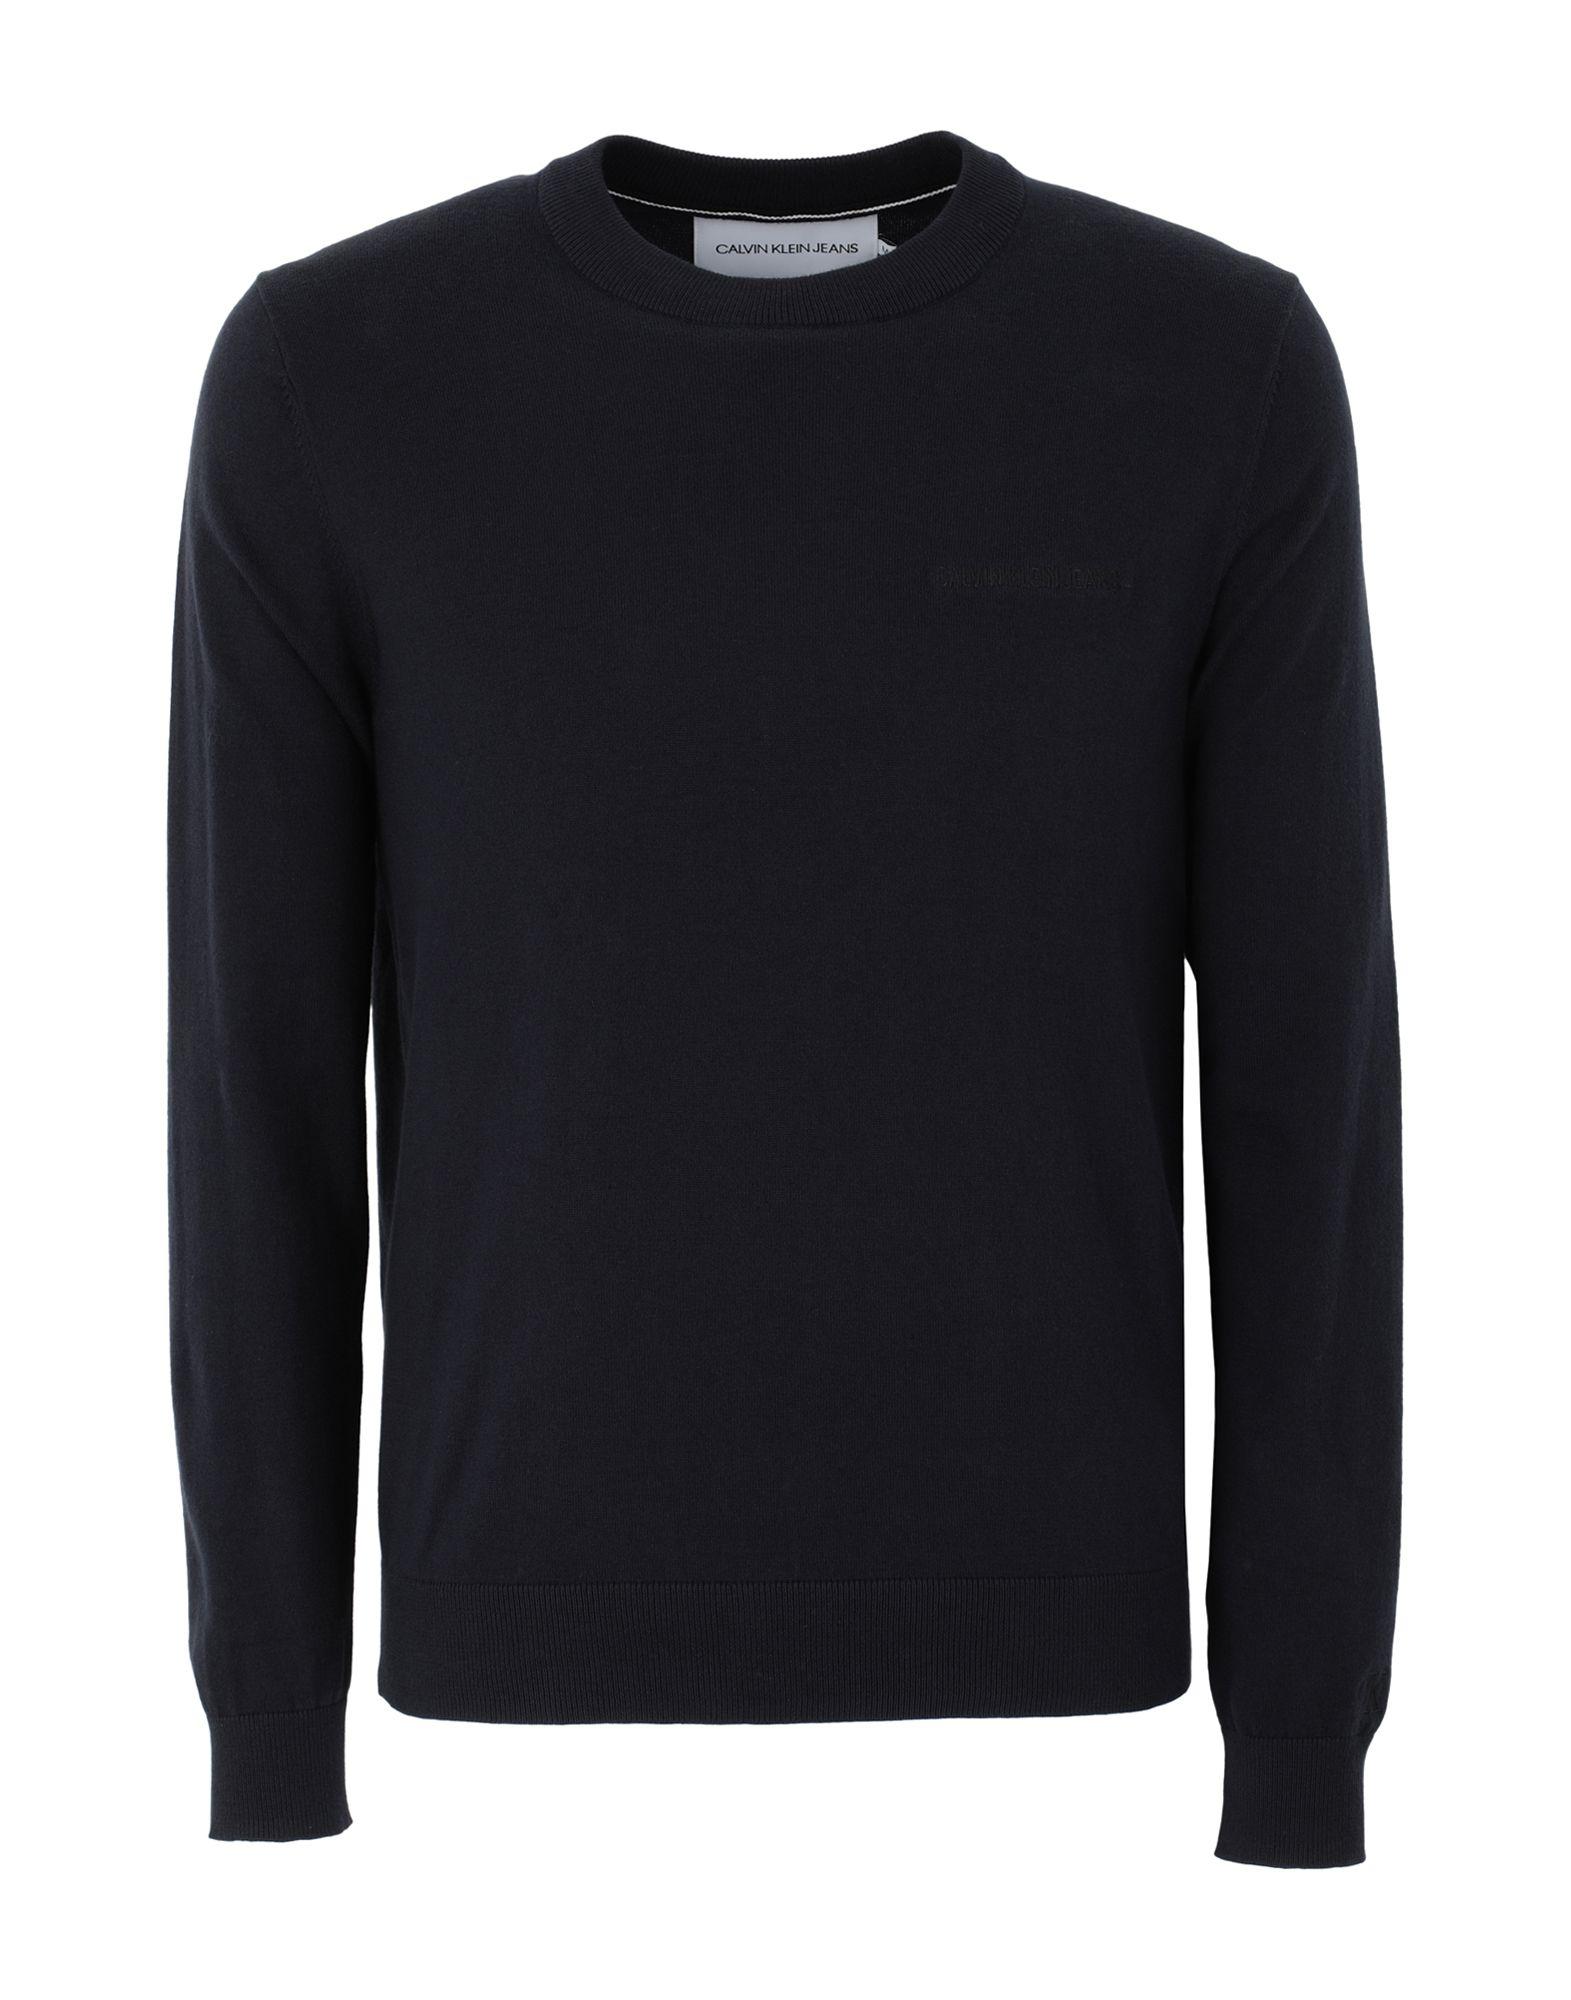 CALVIN KLEIN JEANS Sweaters - Item 14020222